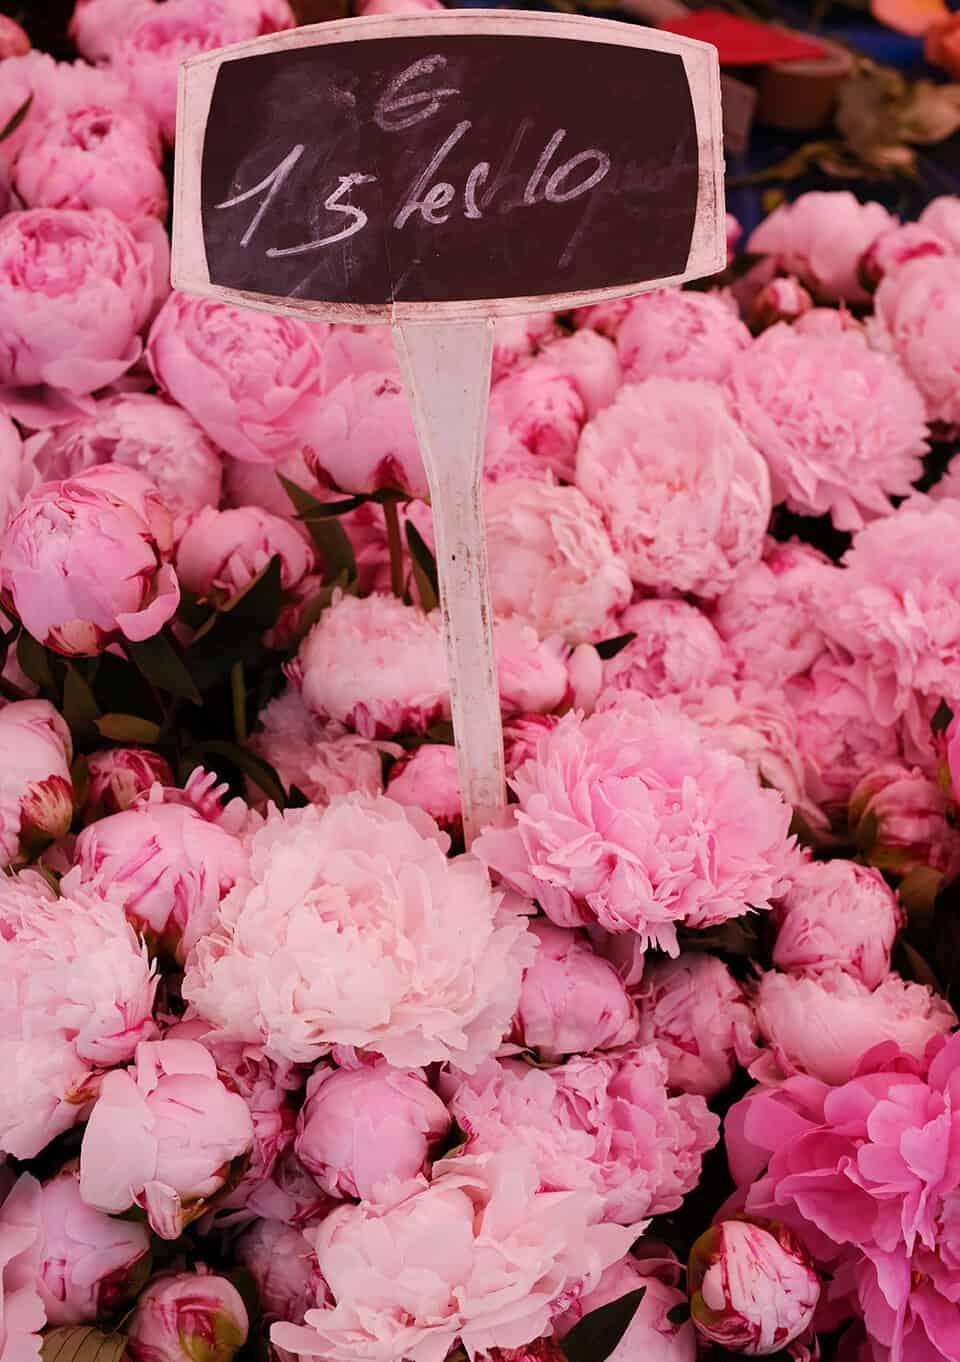 Shop Pink Peonies at the Paris Market Here